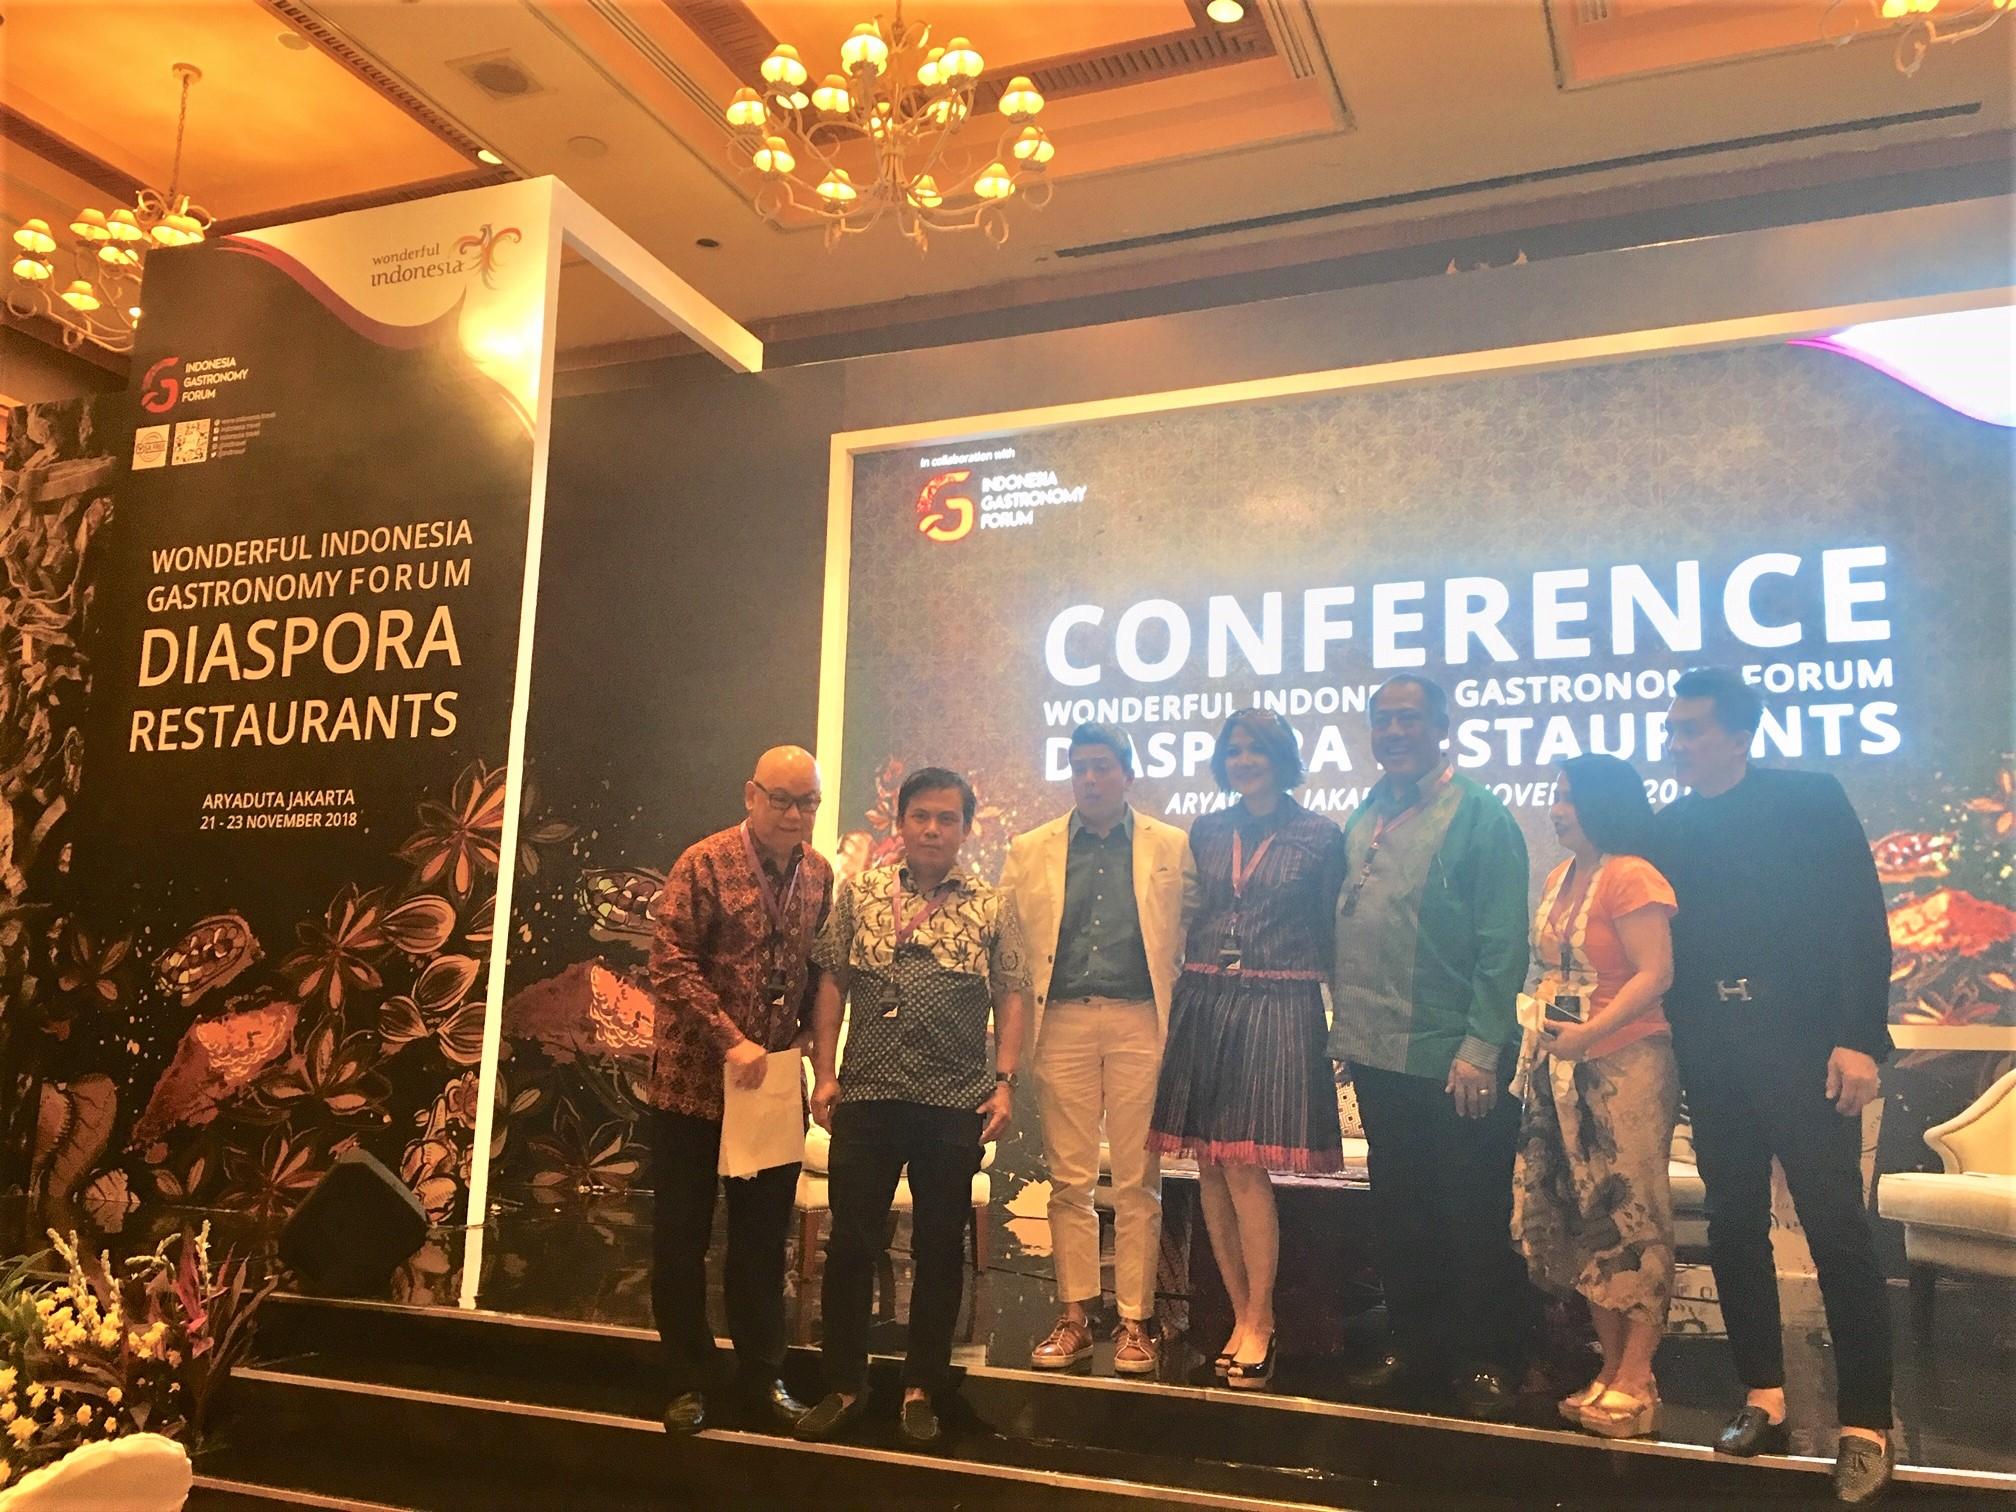 Pembicara di Wonderful Indonesia Gastronomy Forum Diaspora Restaurants   Foto: IDBC